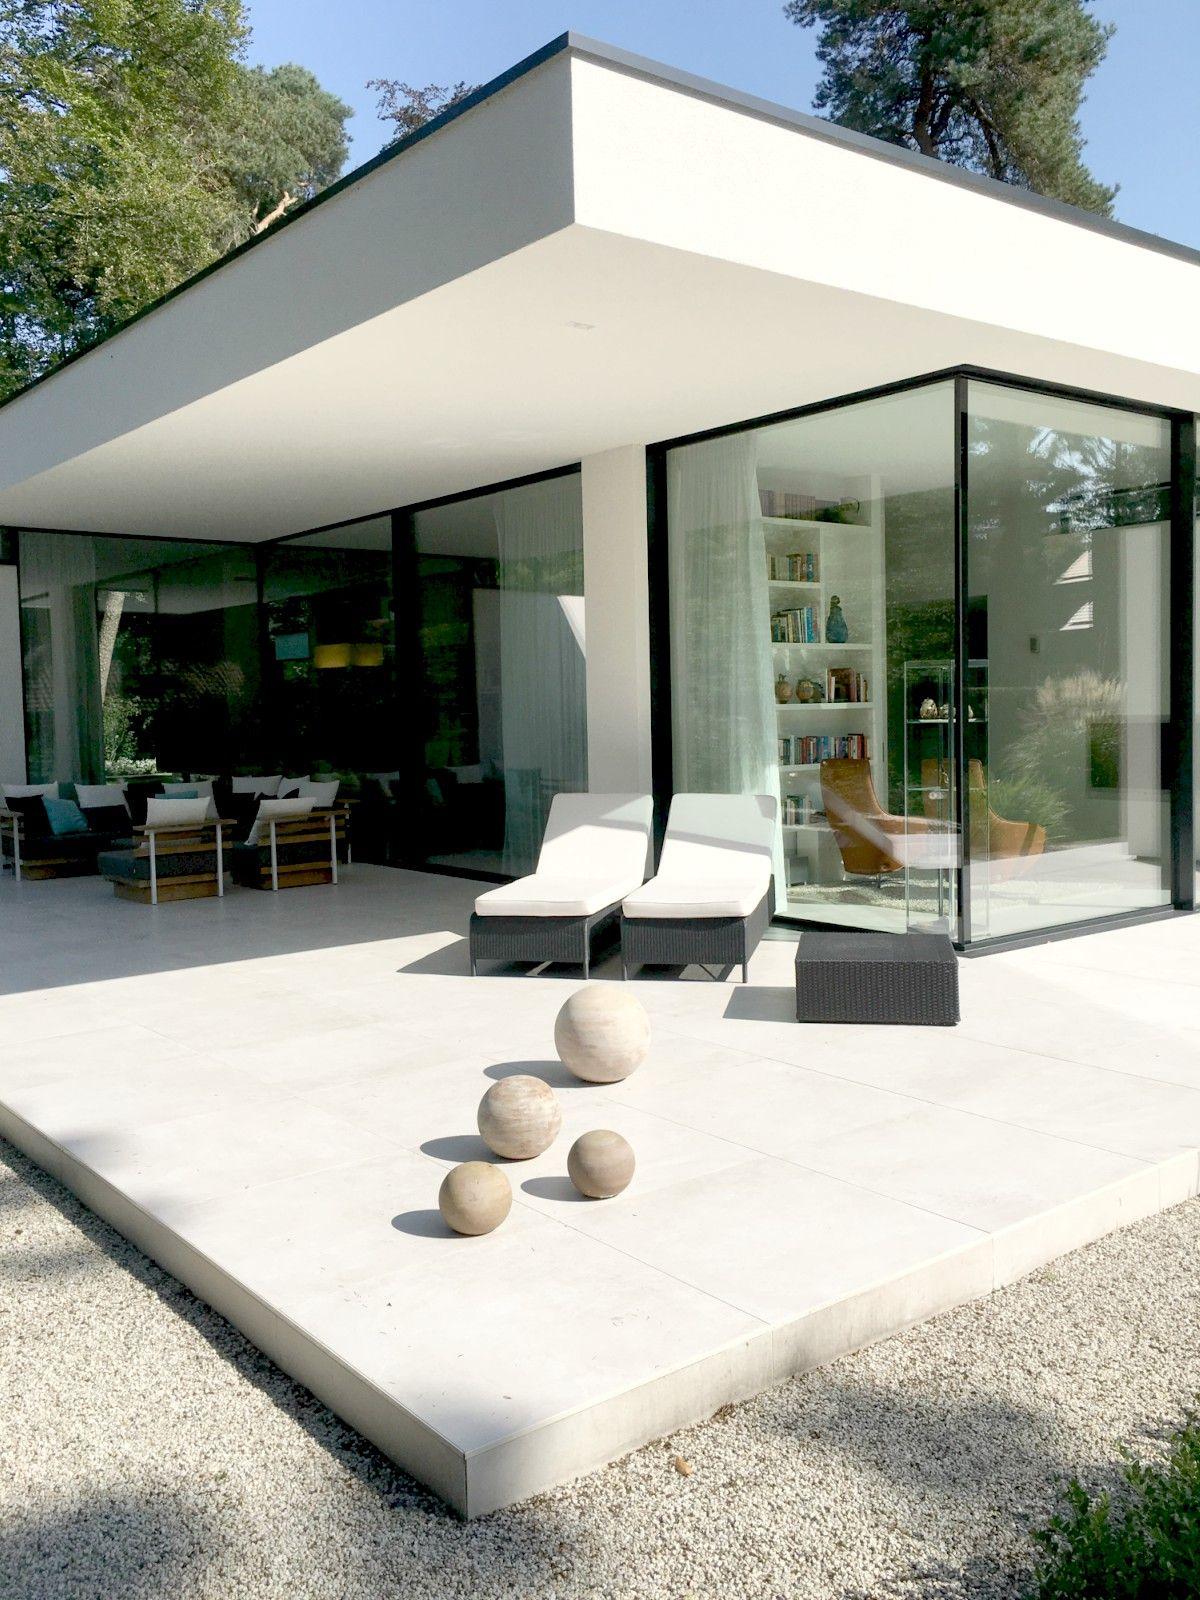 Buitenontwerp, Modern Huis Exterieur, Moderne Tuin